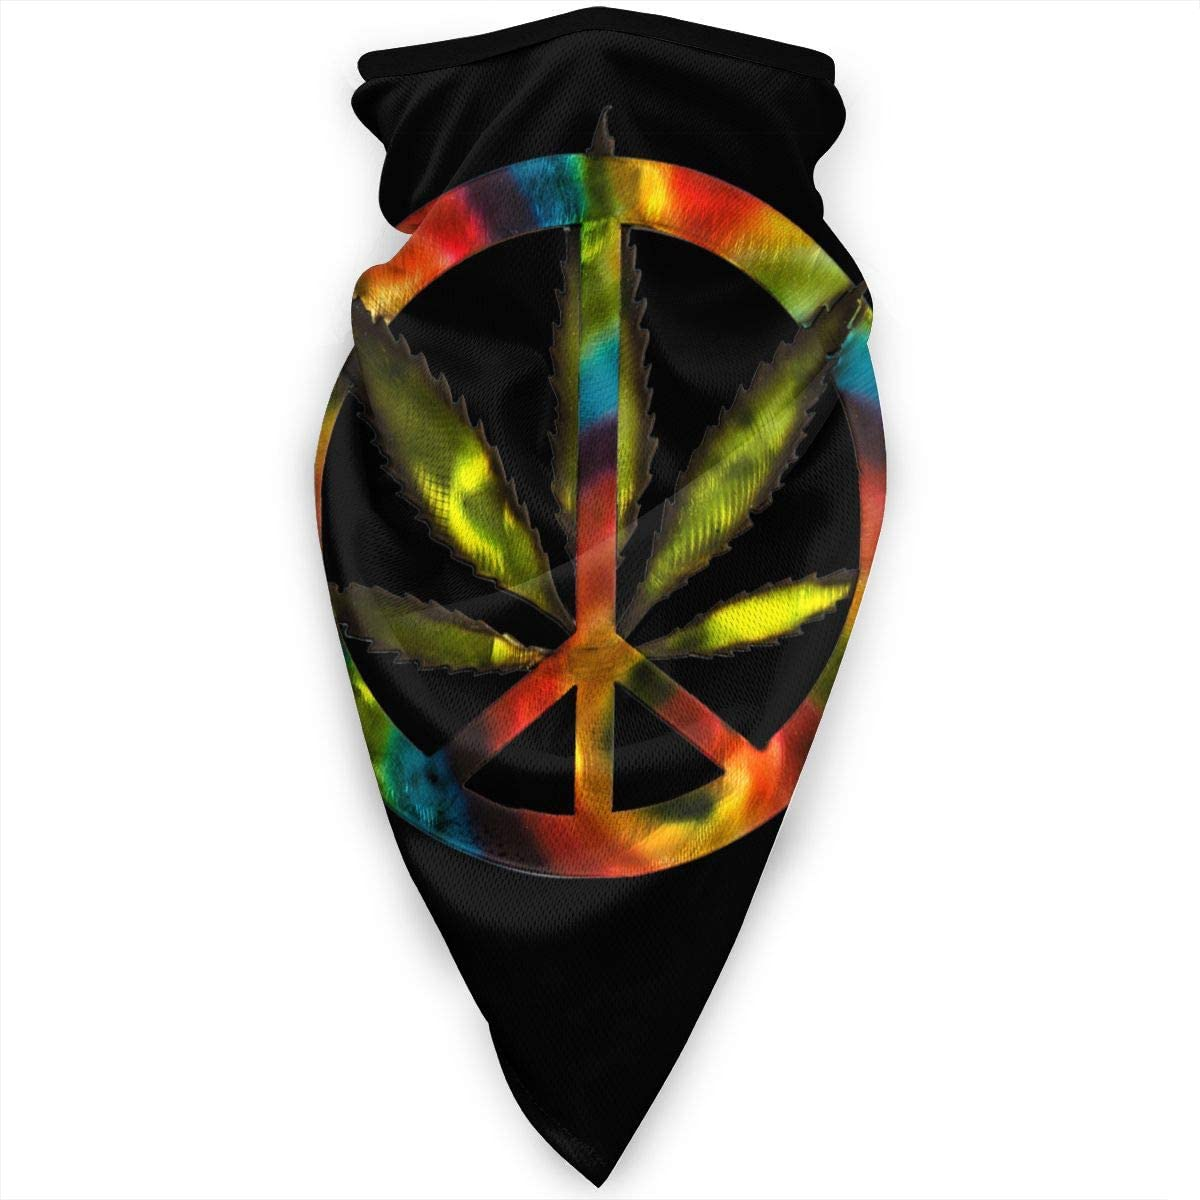 WAY.MAY Cannabis Leaf Tie Dye Peace Sign Windproof Sports Mask Neck Gaiter Bandana Balaclava Warmer Scarf